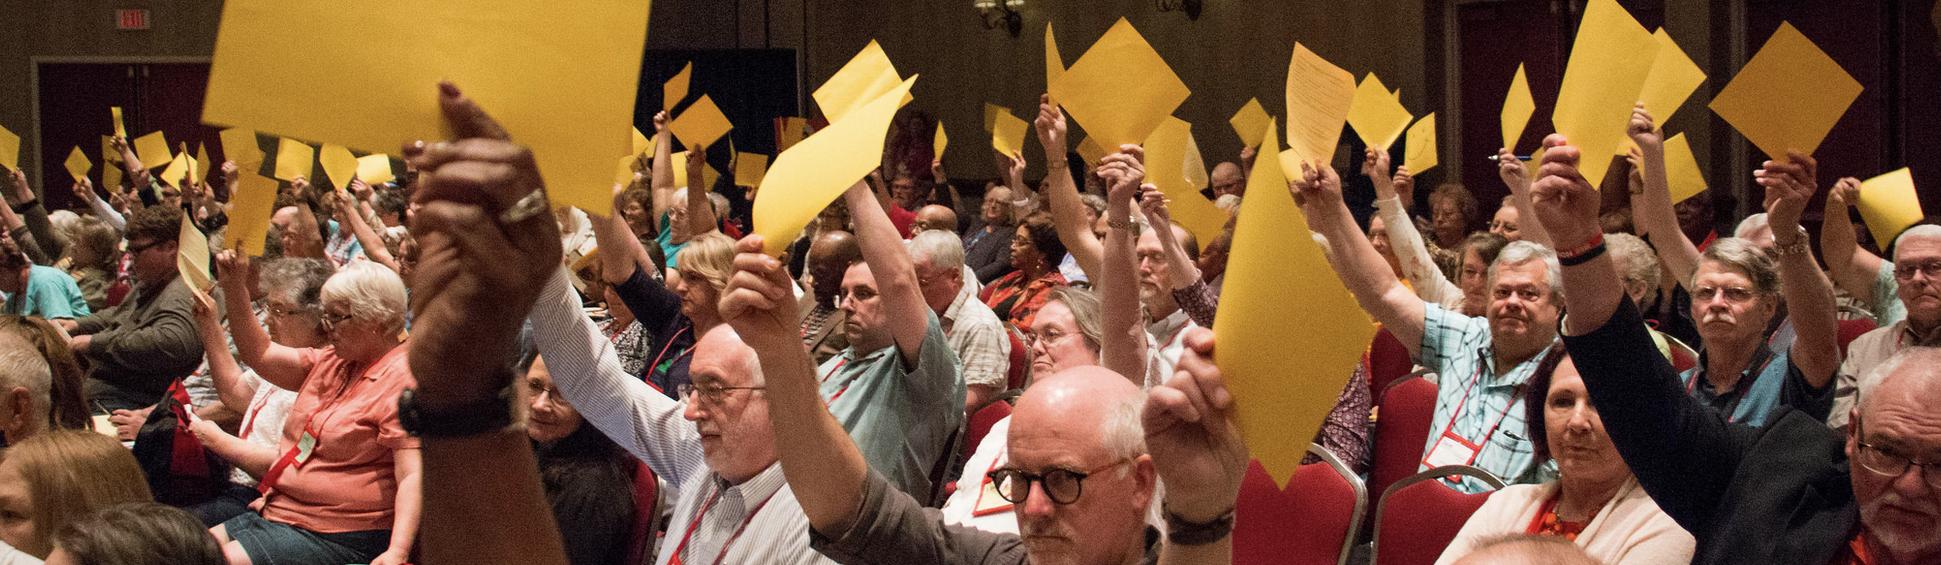 Delegates voting